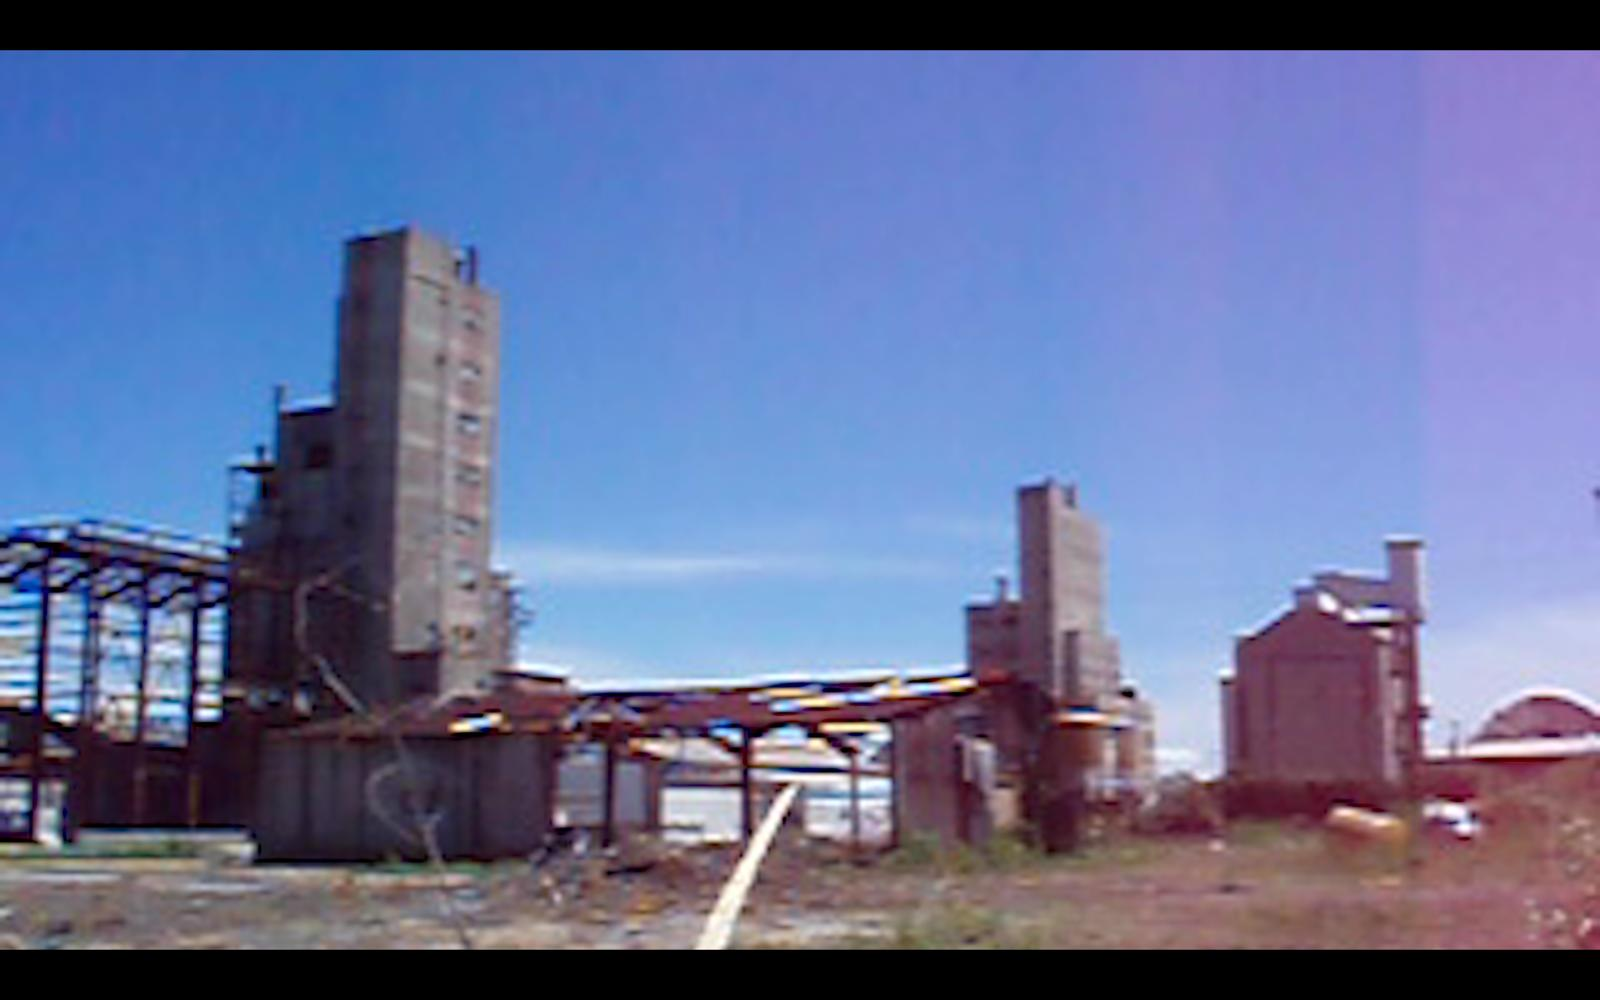 Fabbrica abbandonata a Marghera